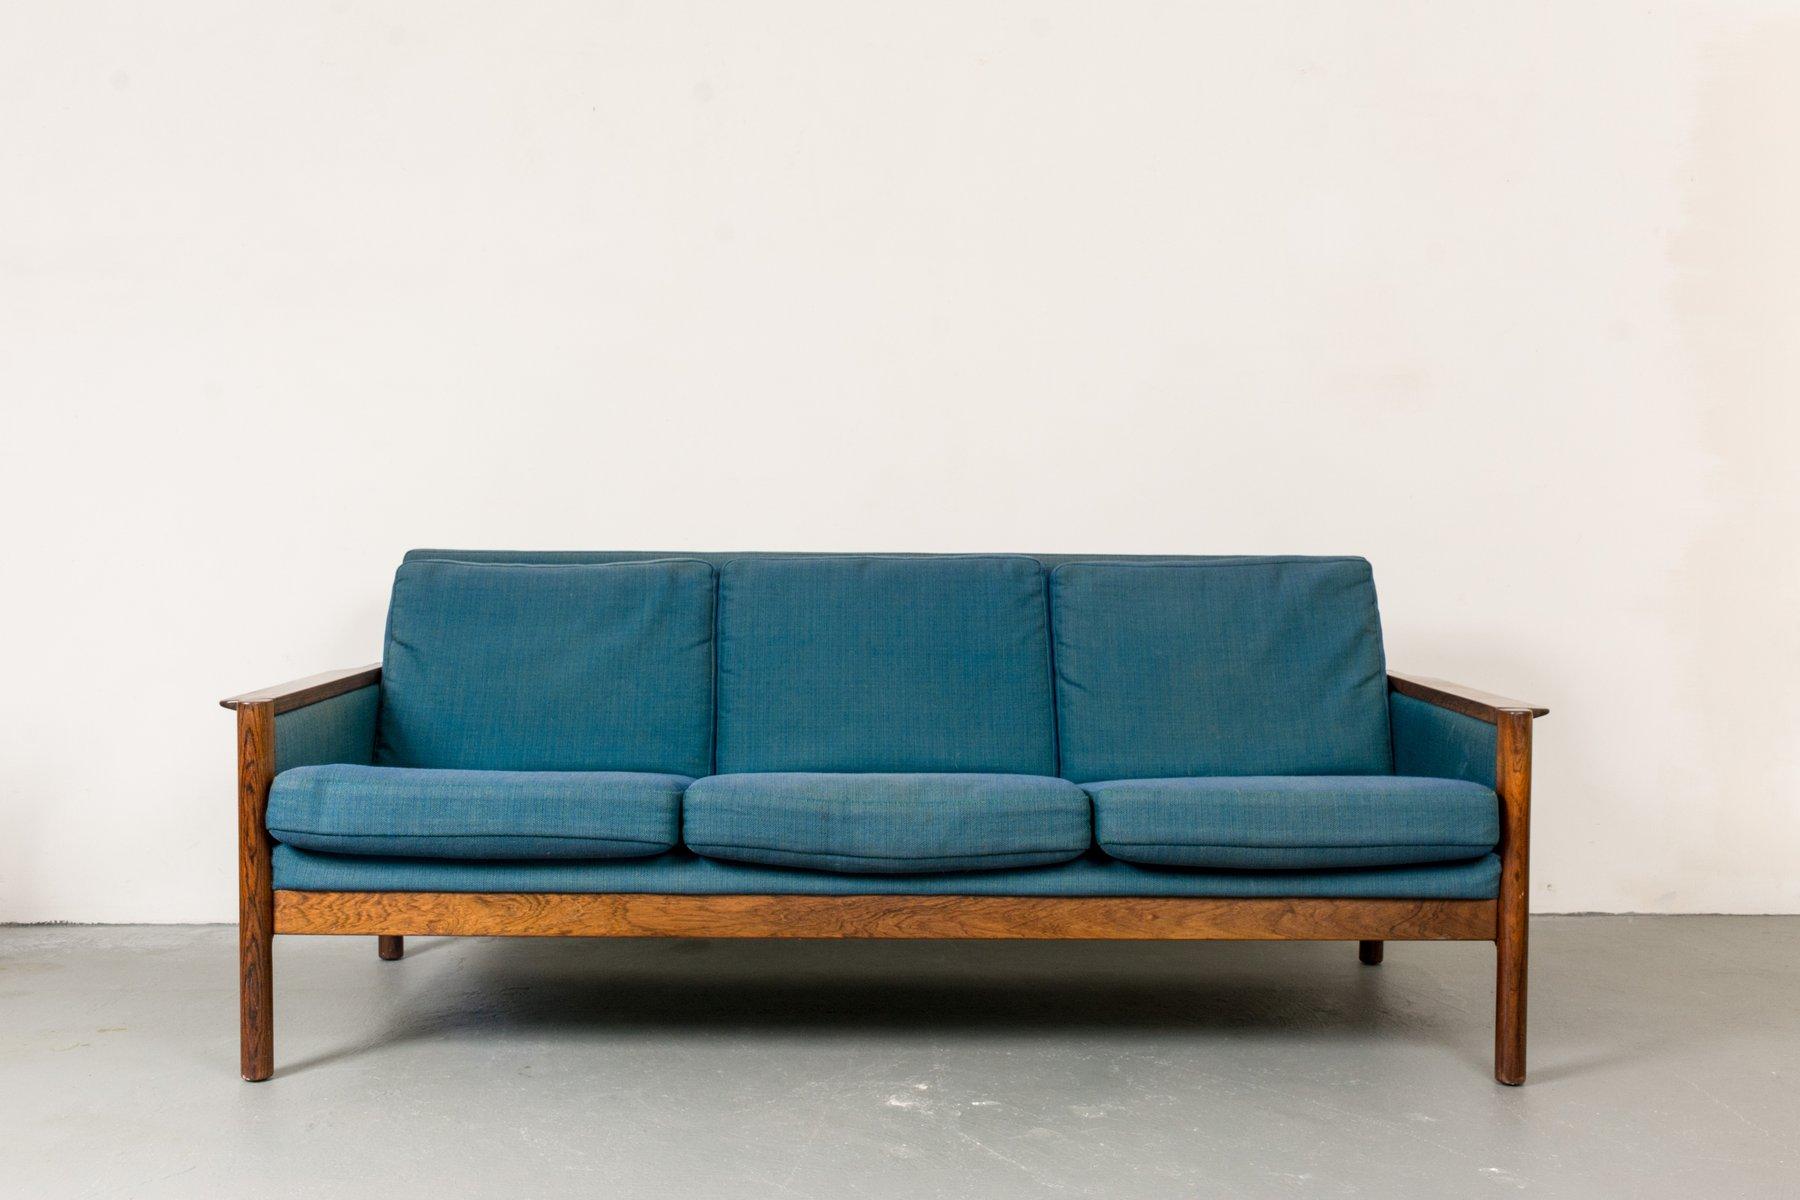 d nisches palisander sofa 1960er bei pamono kaufen. Black Bedroom Furniture Sets. Home Design Ideas